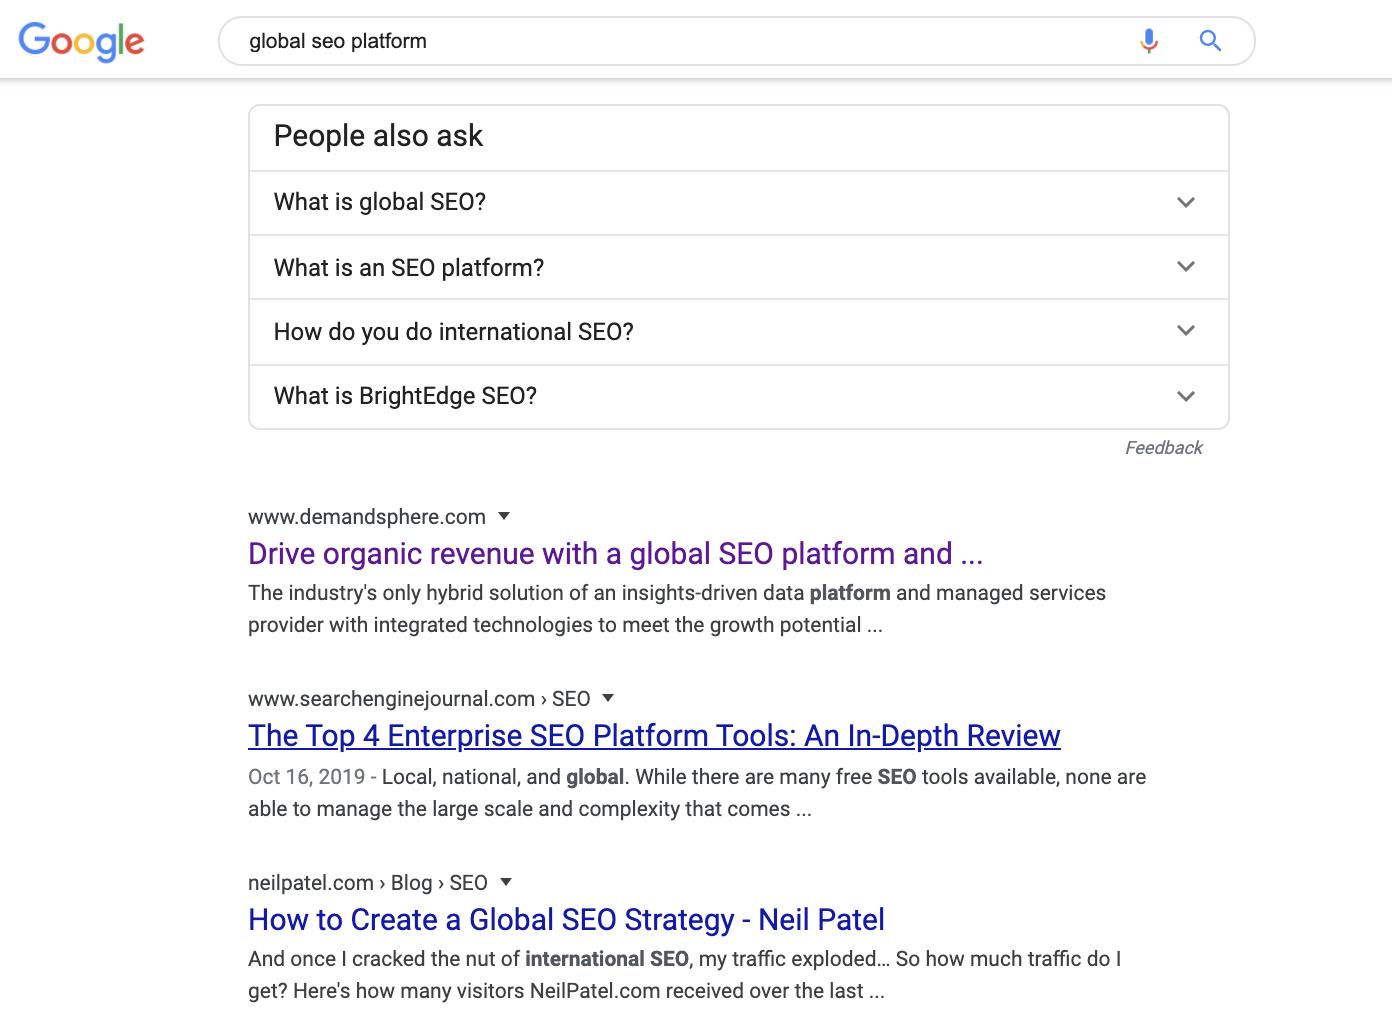 best global SEO platform